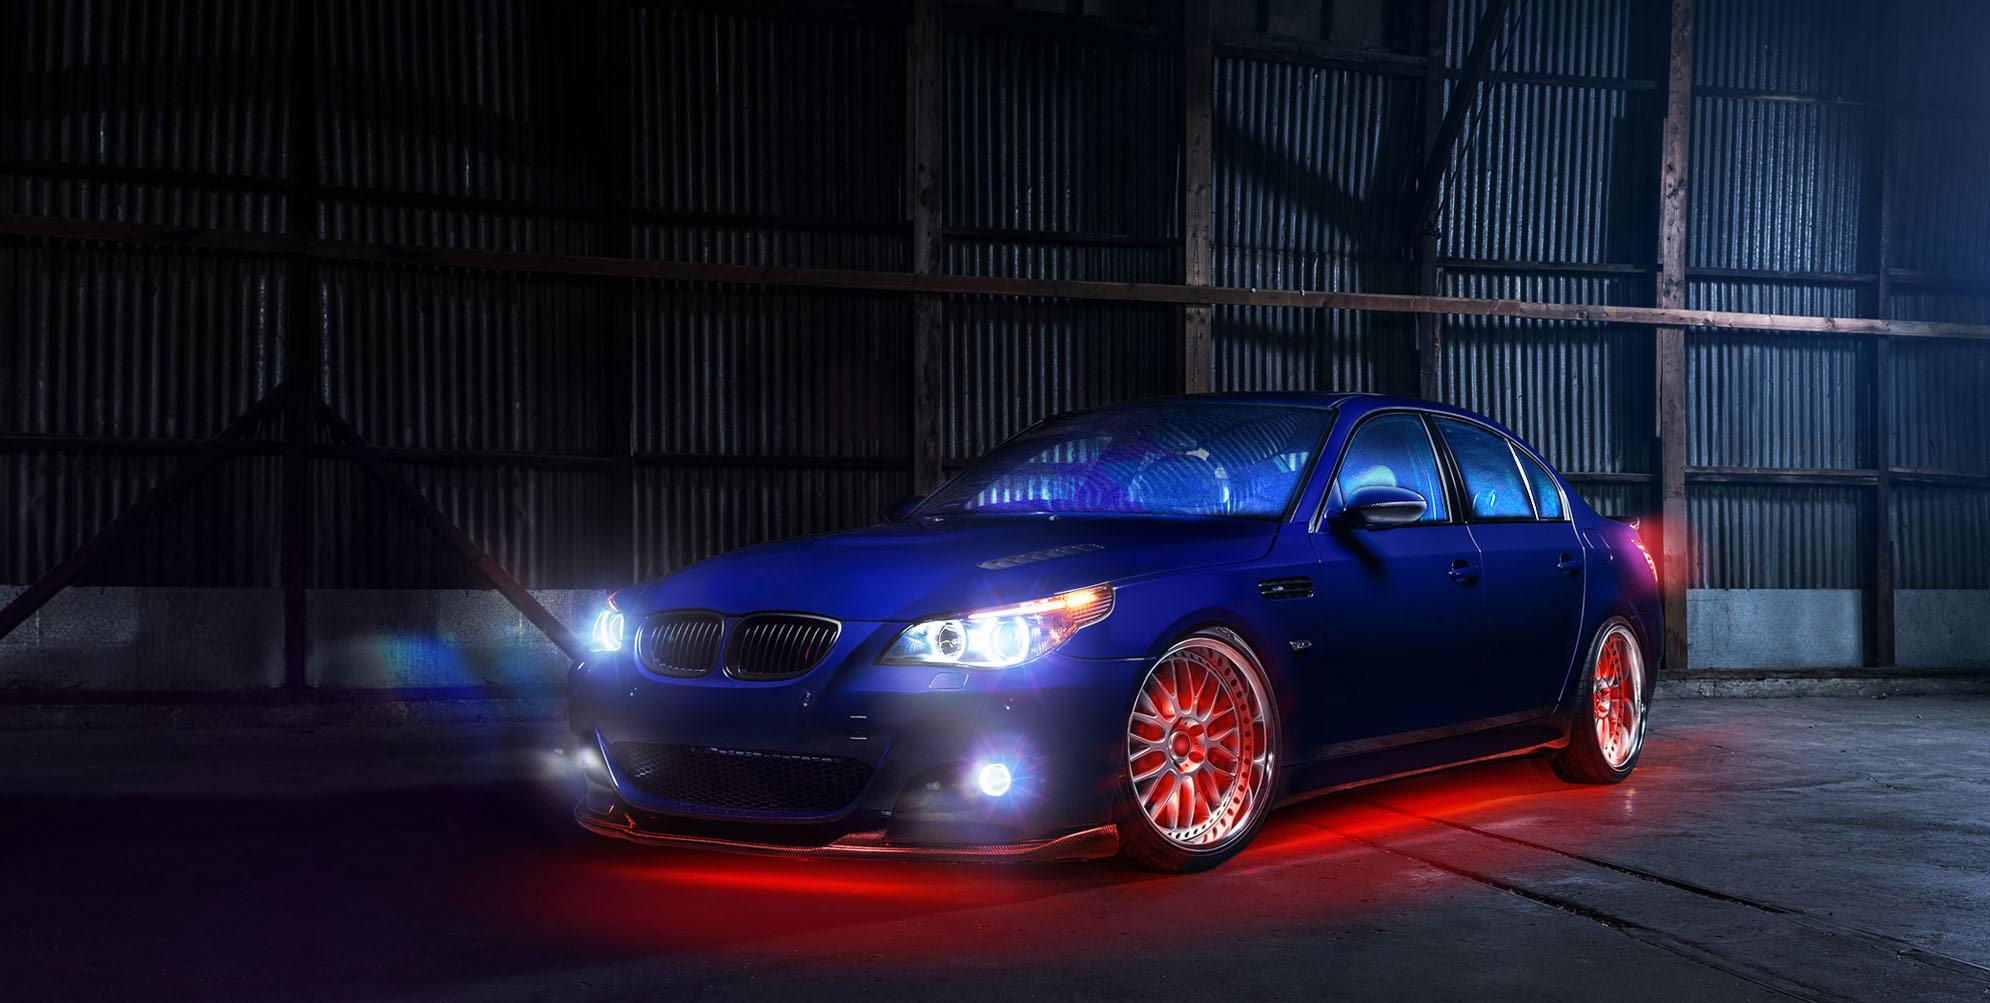 car LED lights car LED lights on & OPT7 - LED u0026 HID Lighting for Cars Trucks u0026 Motorcycles